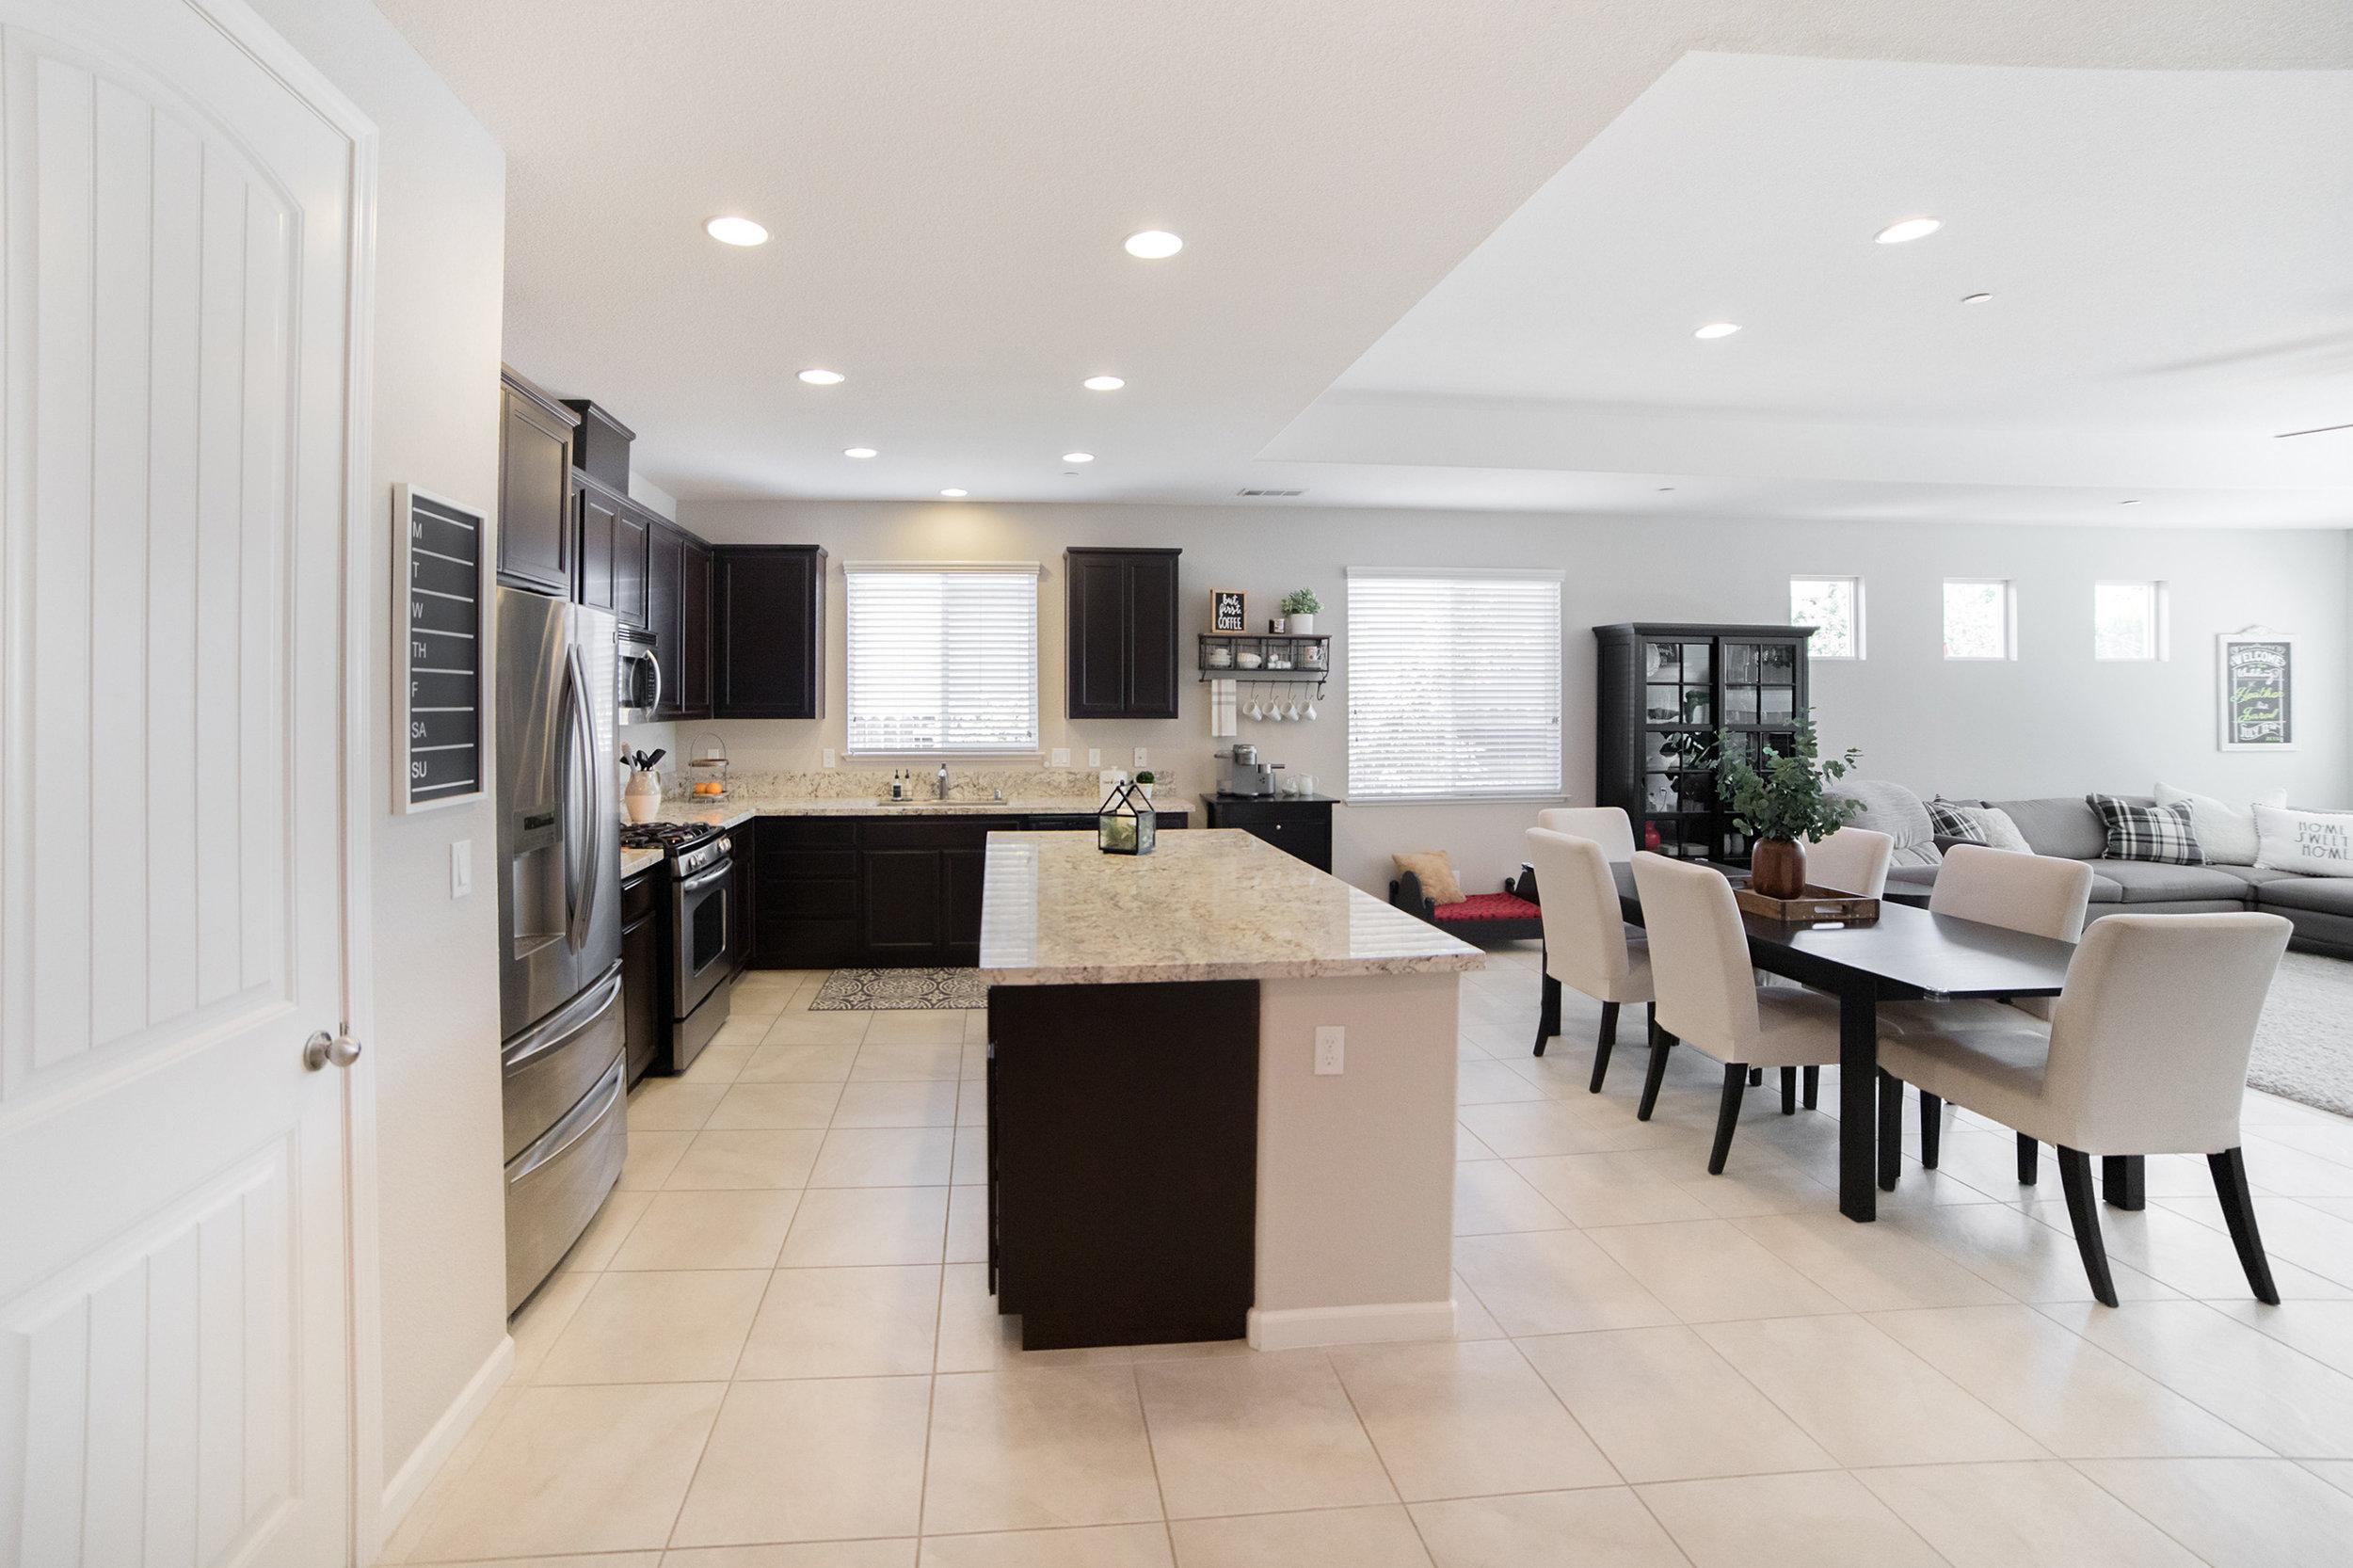 Focal Room kitchen-living - 01.jpg